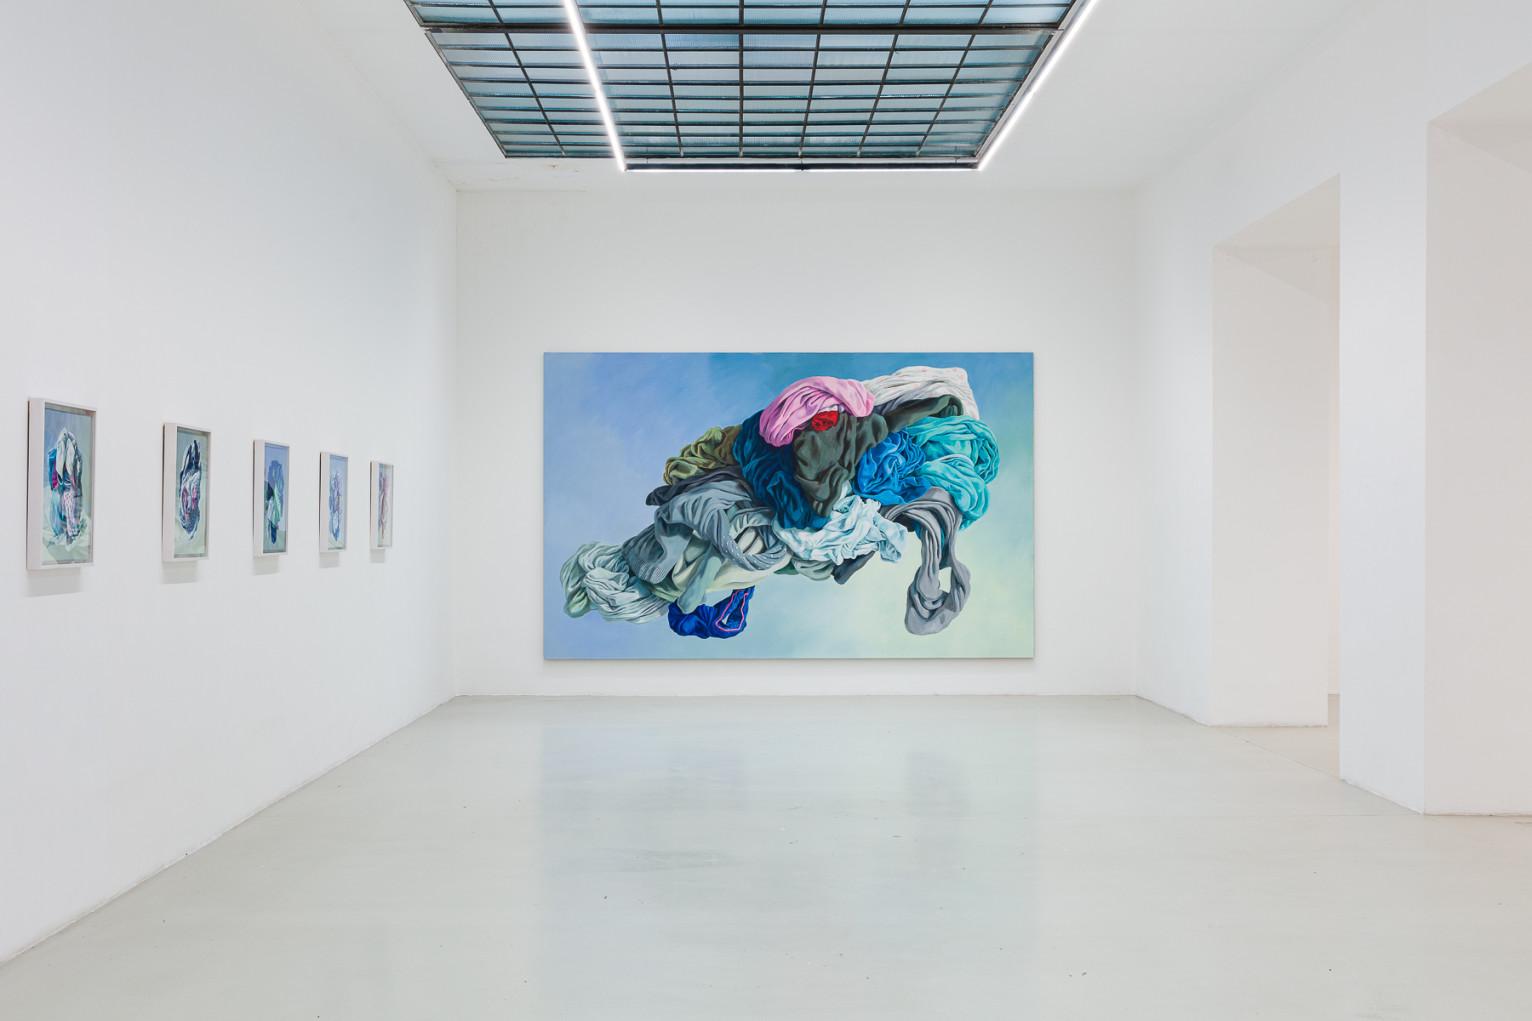 Alina Kunitsyna | Helium Ecstasy 27 November 2019 - 18 January 2020 Photo: kunst-dokumentation.com